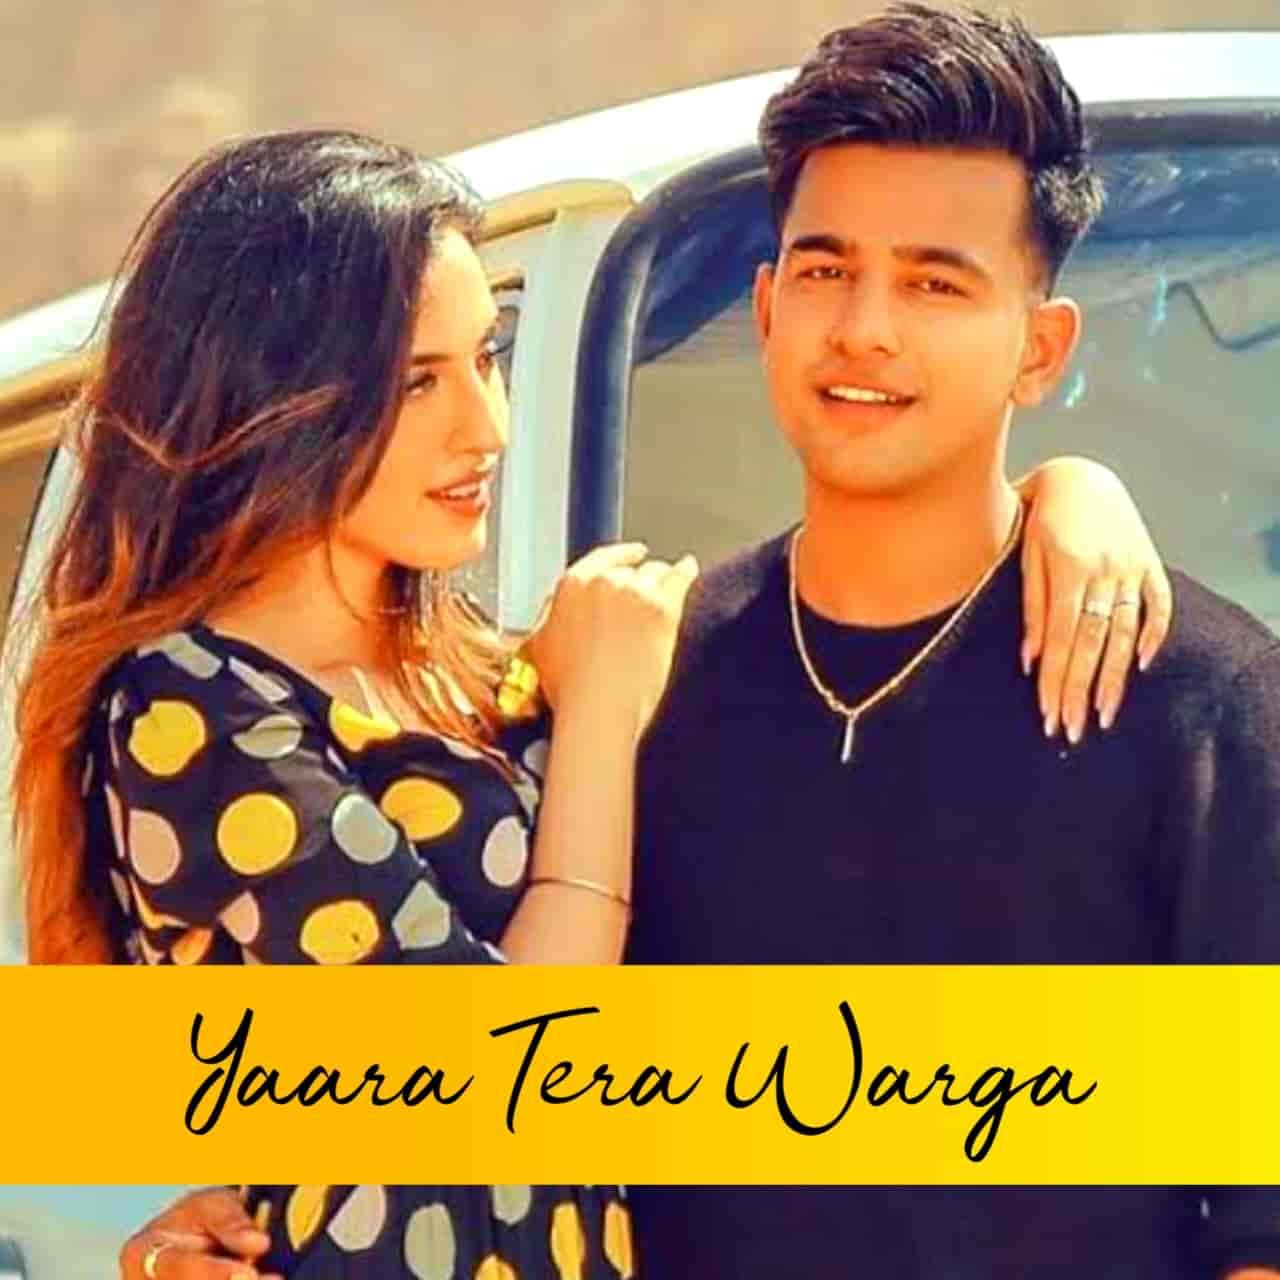 Yaara Tere Warga Punjabi Love Song Lyrics, Sung By Jass Manak And Sunidhi Chauhan.